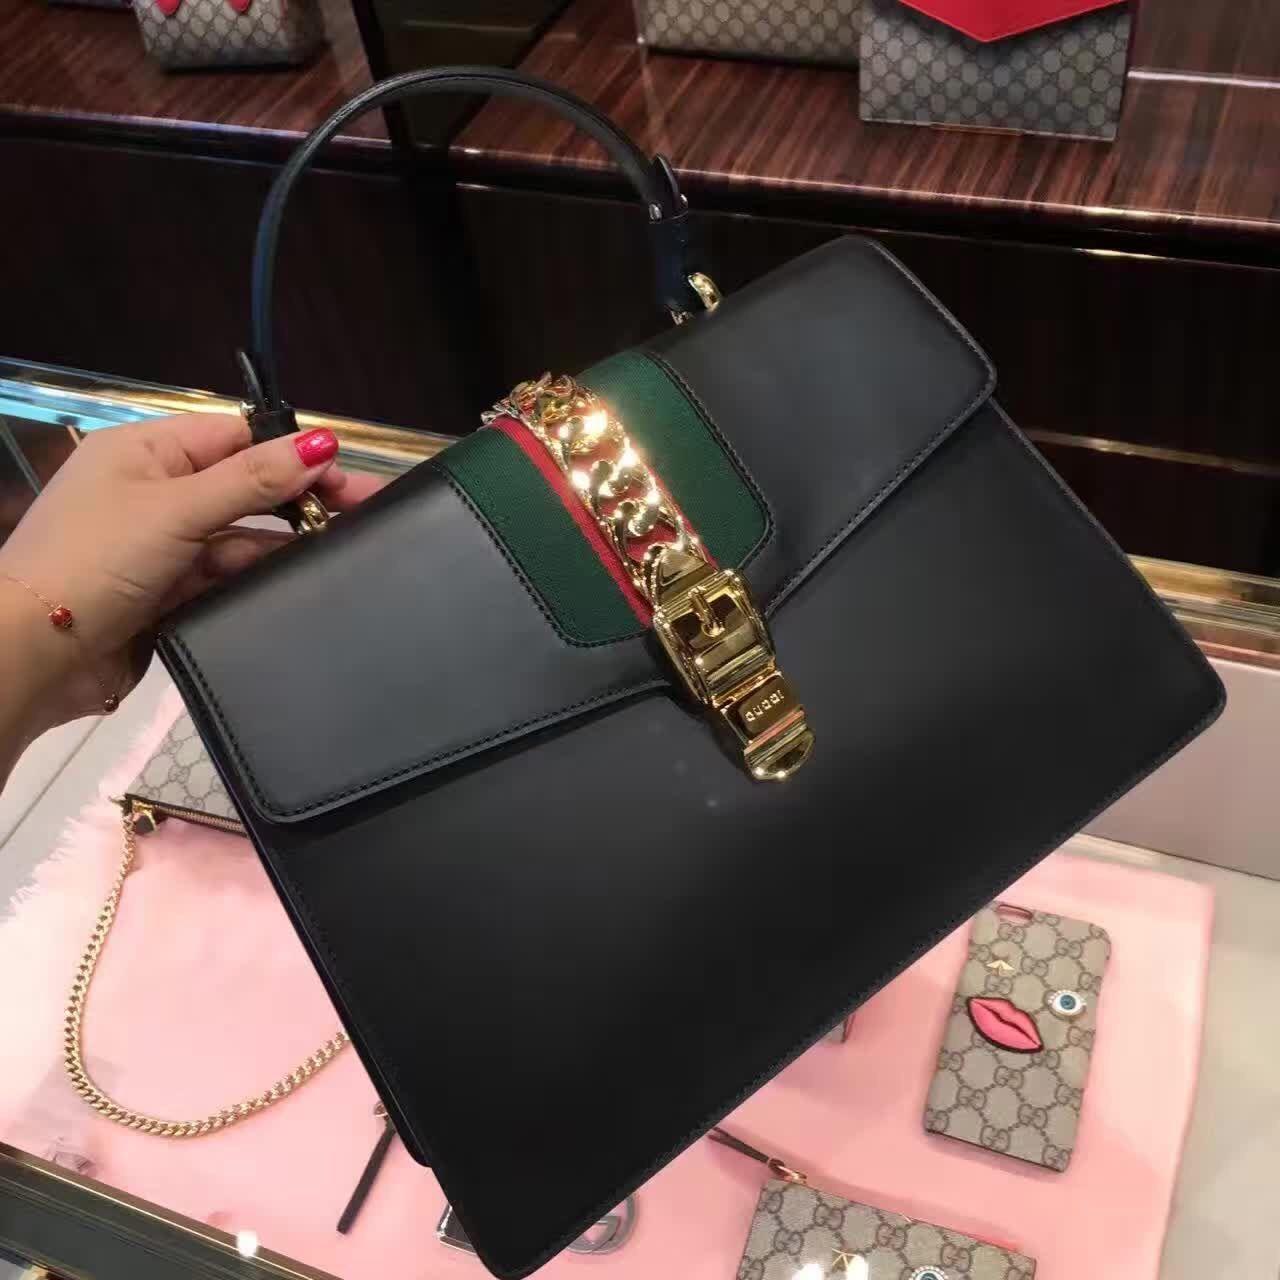 85fe99934c71 Gucci Sylvie Leather Top Handle Bag 431665 Black #gucci #sylvie #bags  #handlebags #guccisylviebags #gucci #guccipurses